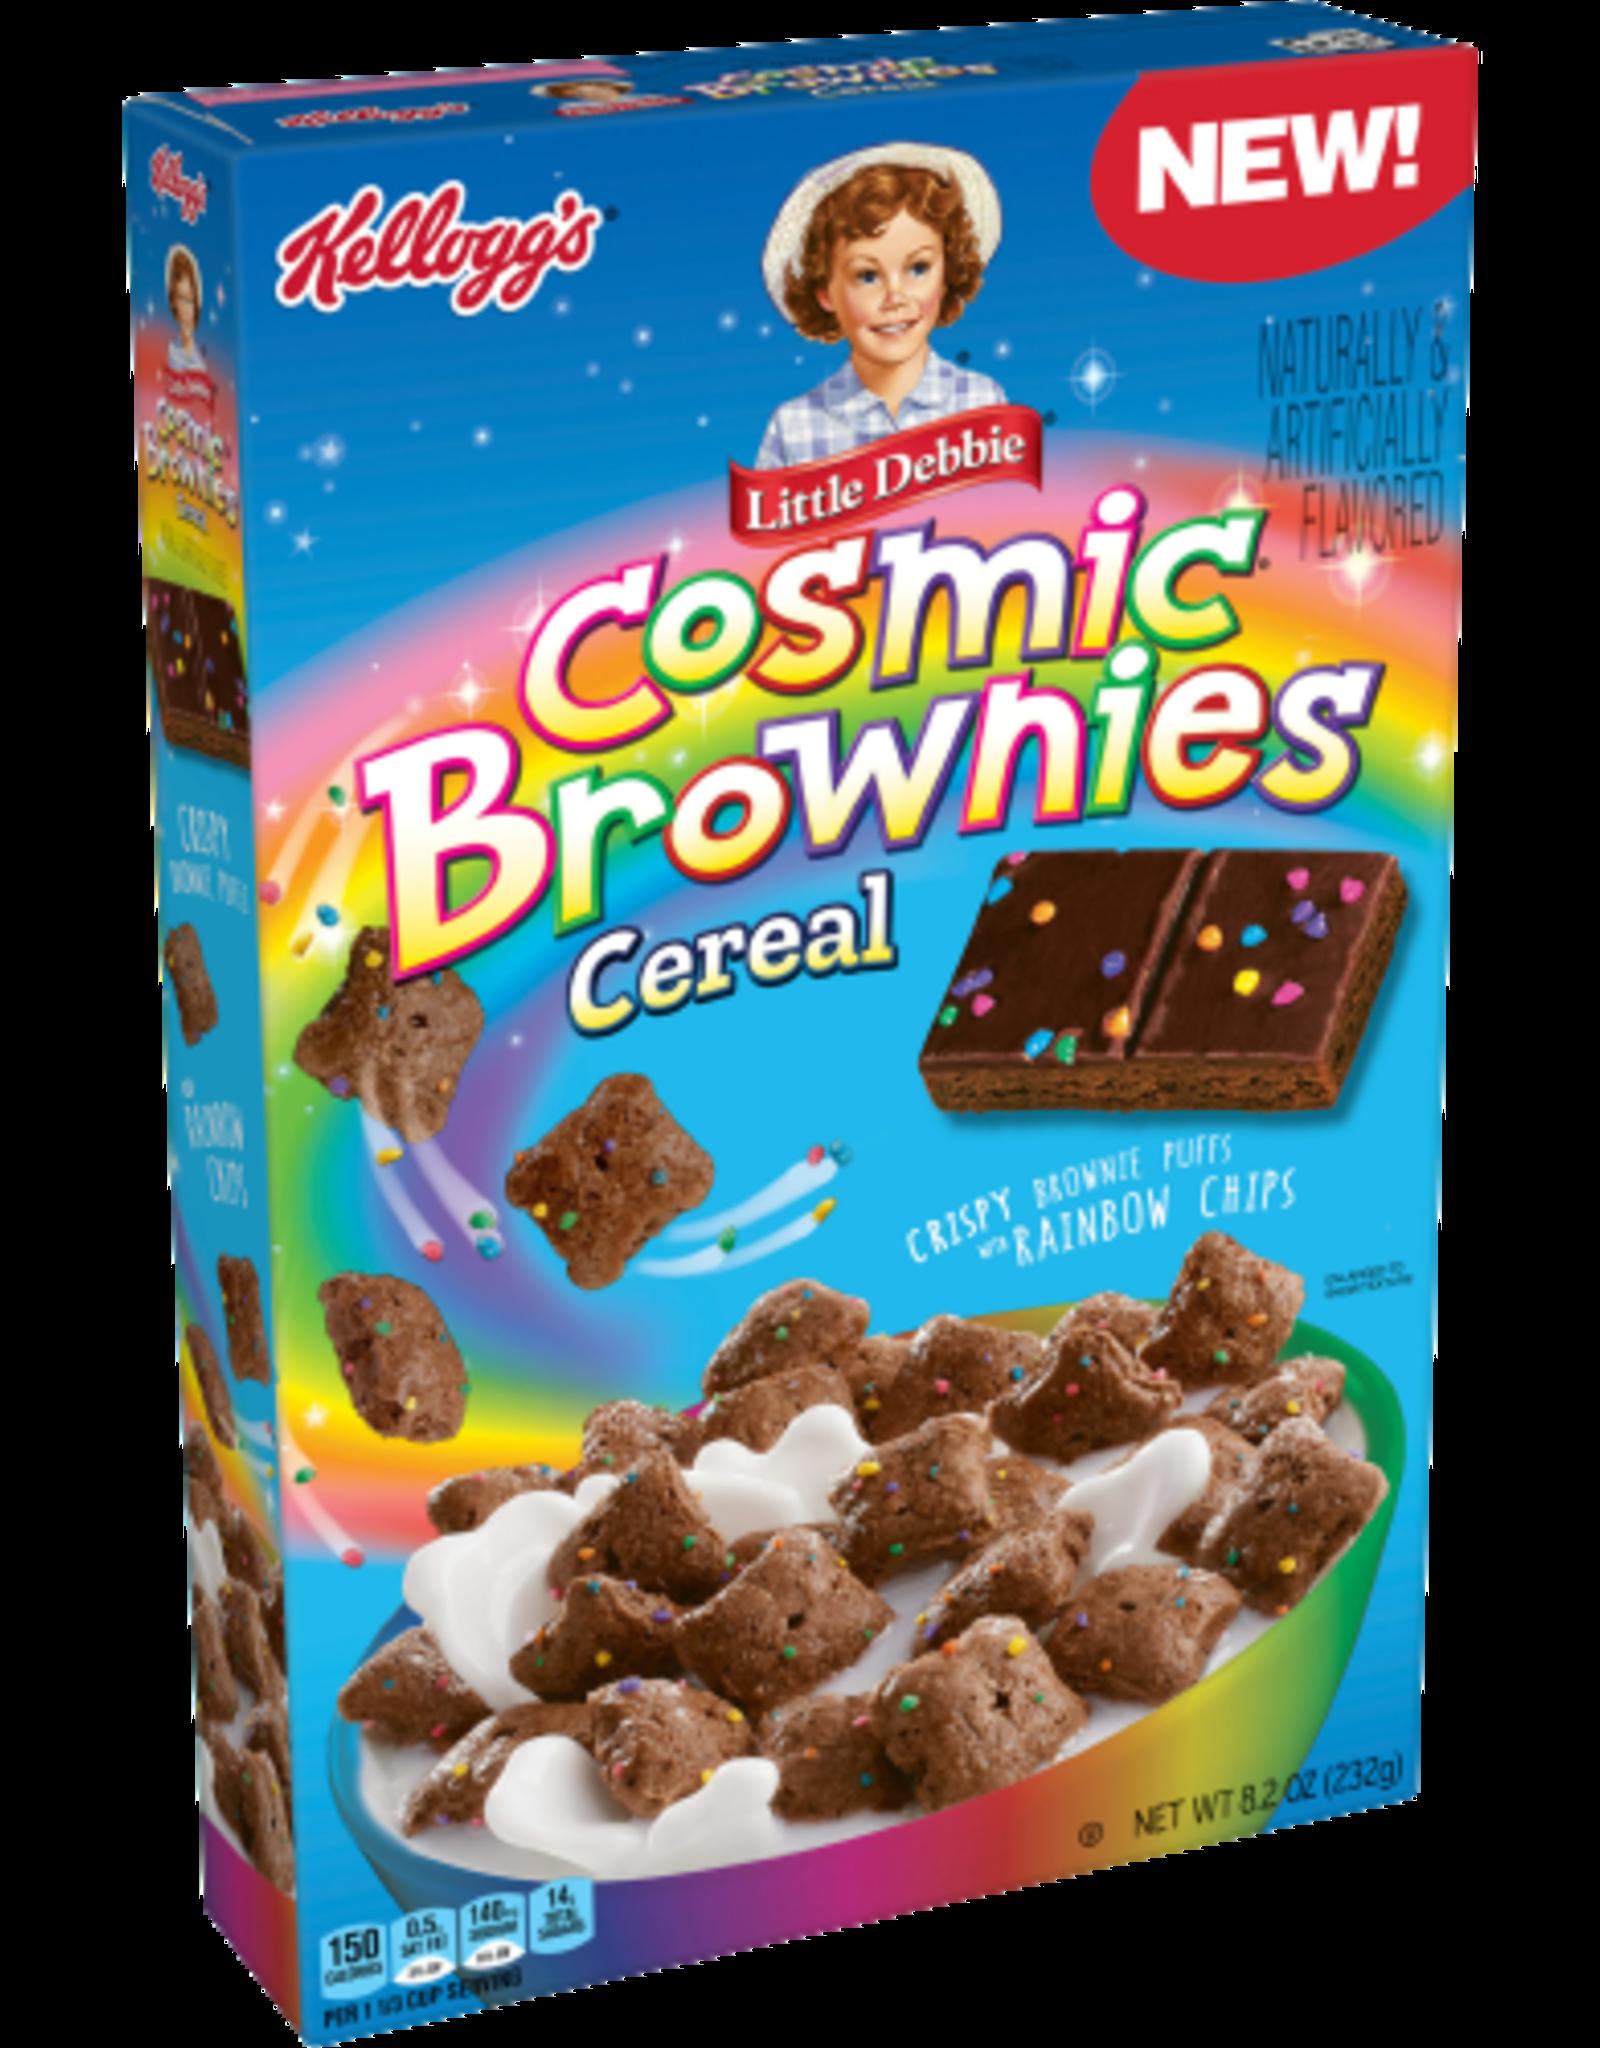 Kellogg's Little Debbie Cosmic Brownie